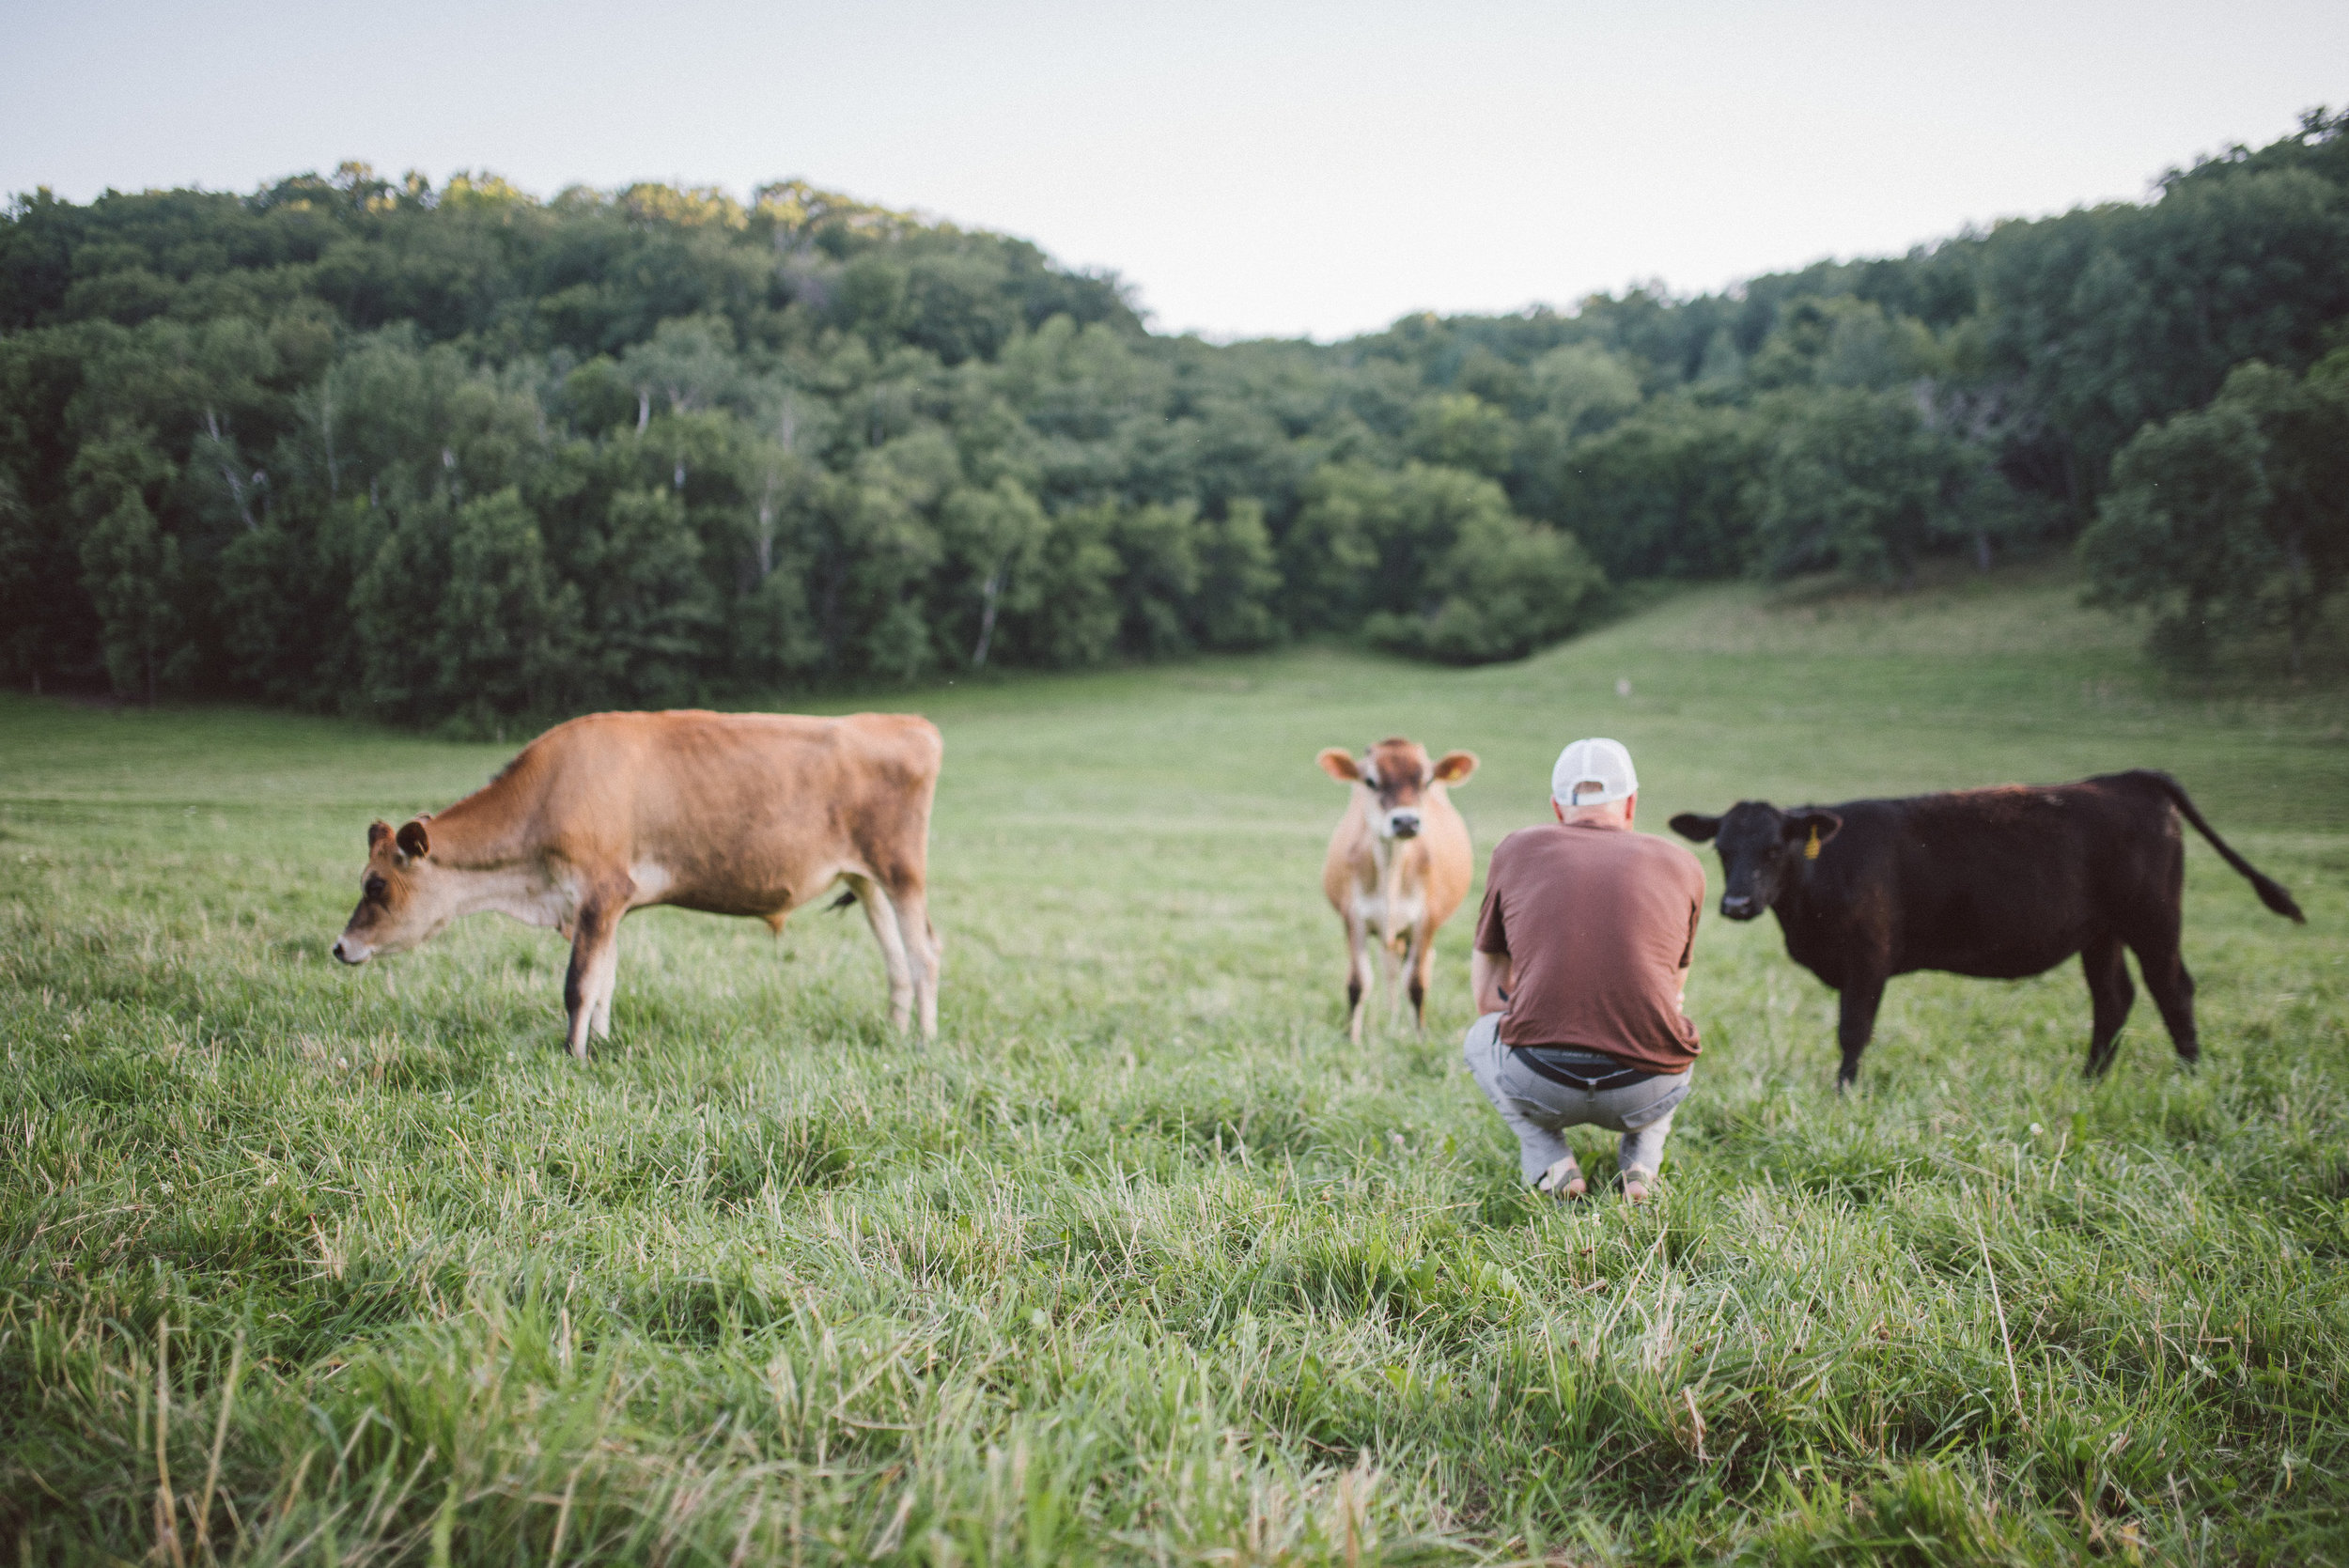 Cate_Family_Farm_Wisconsin-87.jpg